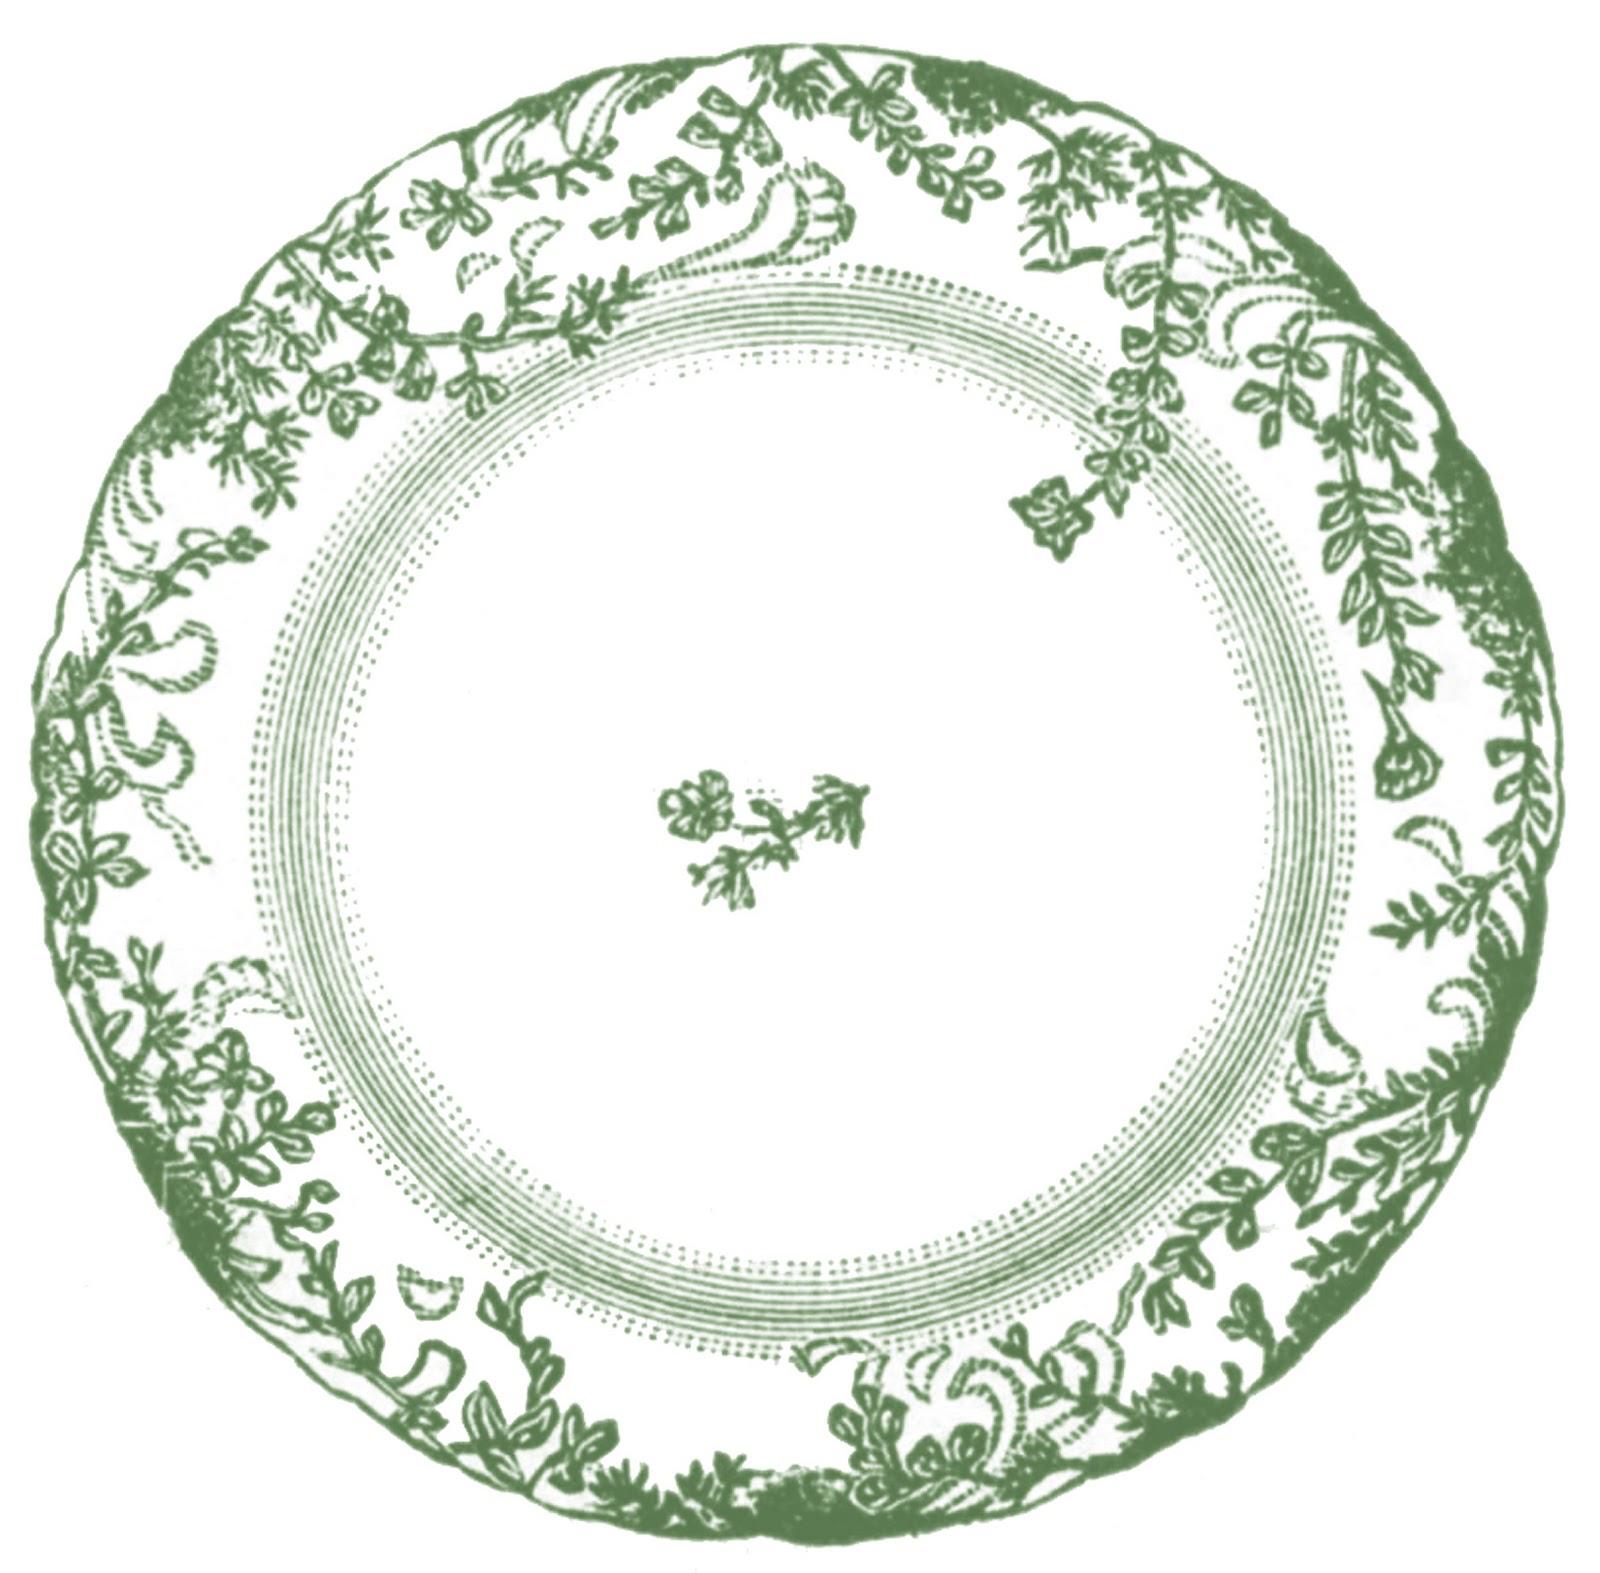 Vintage Clip Art - Antique China Plate - 4 Options - The Graphics ...: thegraphicsfairy.com/vintage-clip-art-antique-china-plate-4-options